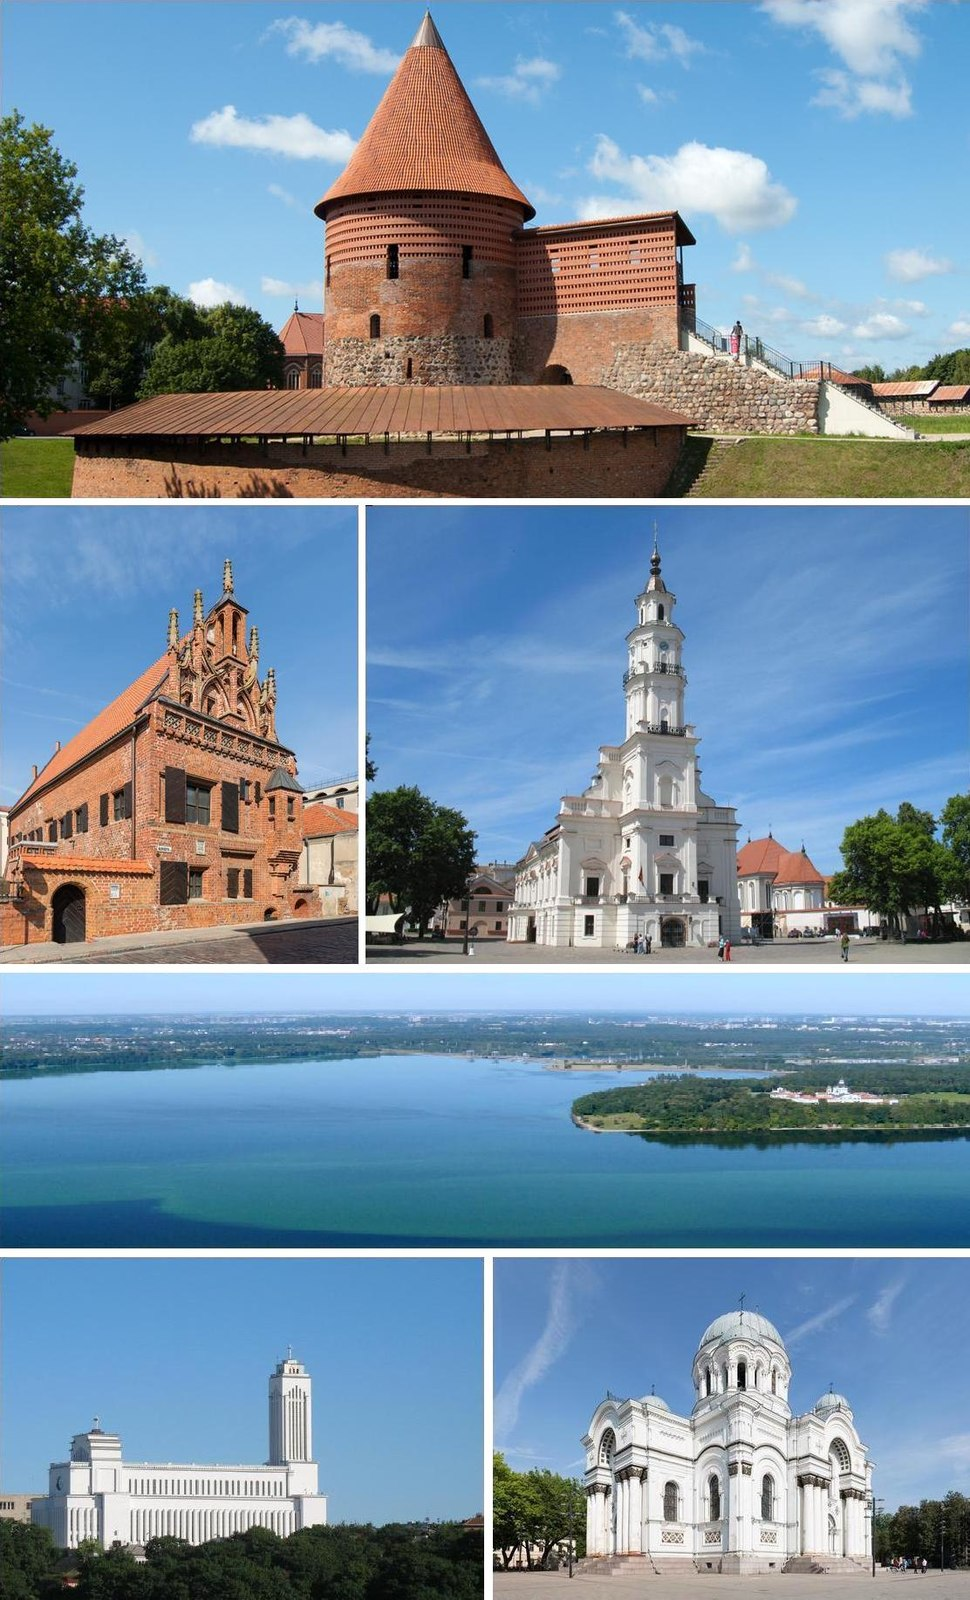 Top to bottom, left to right: Kaunas Castle, House of Perkūnas, Kaunas Town Hall, Kaunas Reservoir, Our Lord Jesus Christ's Resurrection Basilica and Church of Saint Michael the Archangel